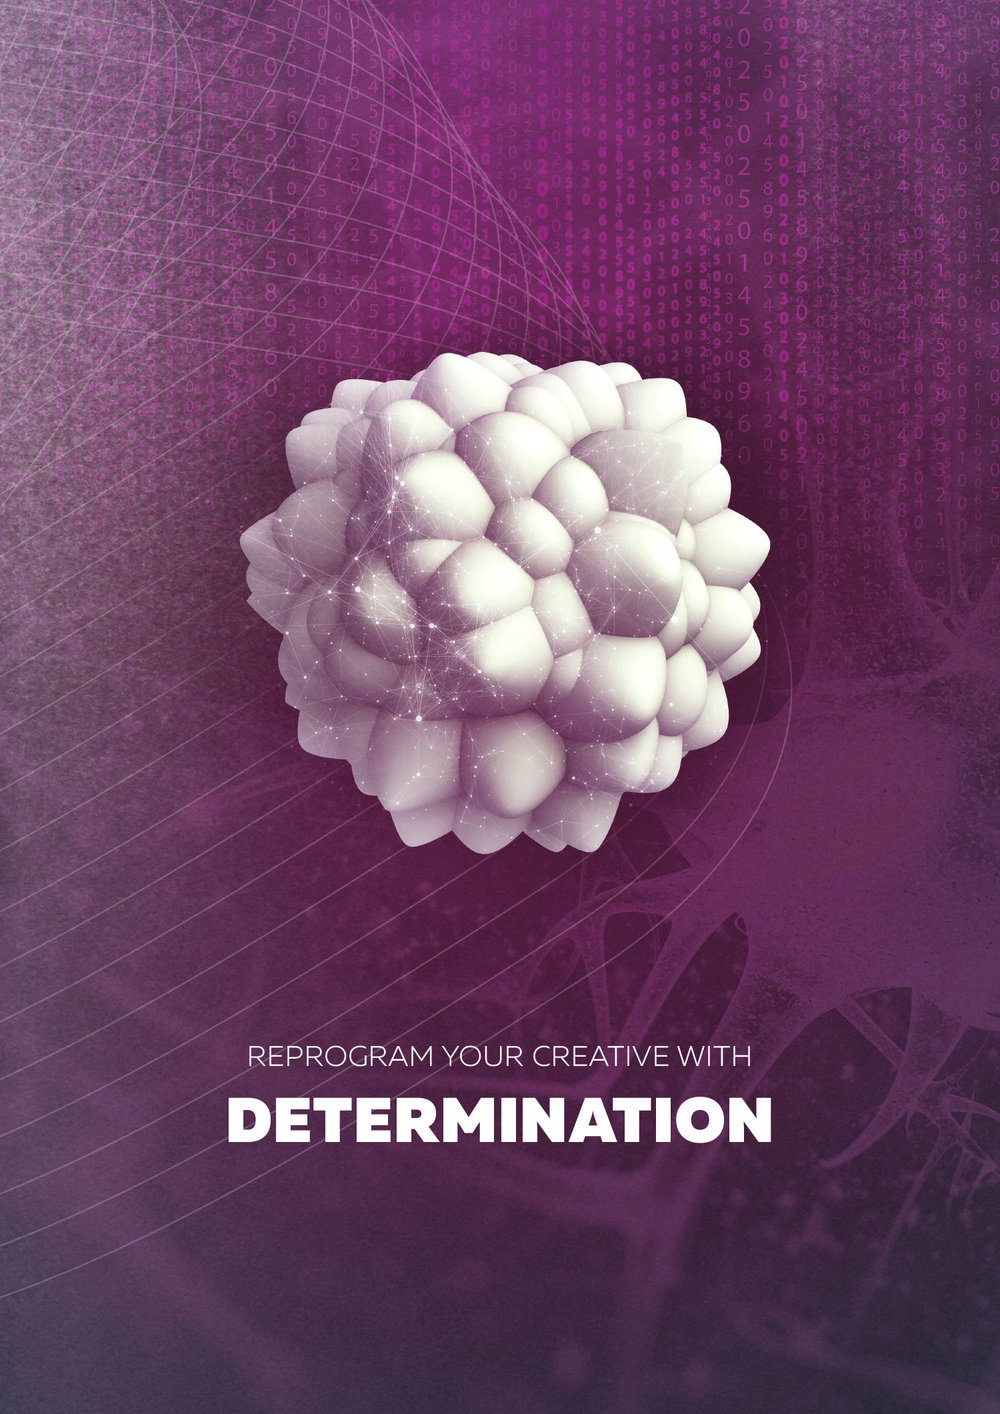 1500px-AI-determination-poster.jpg